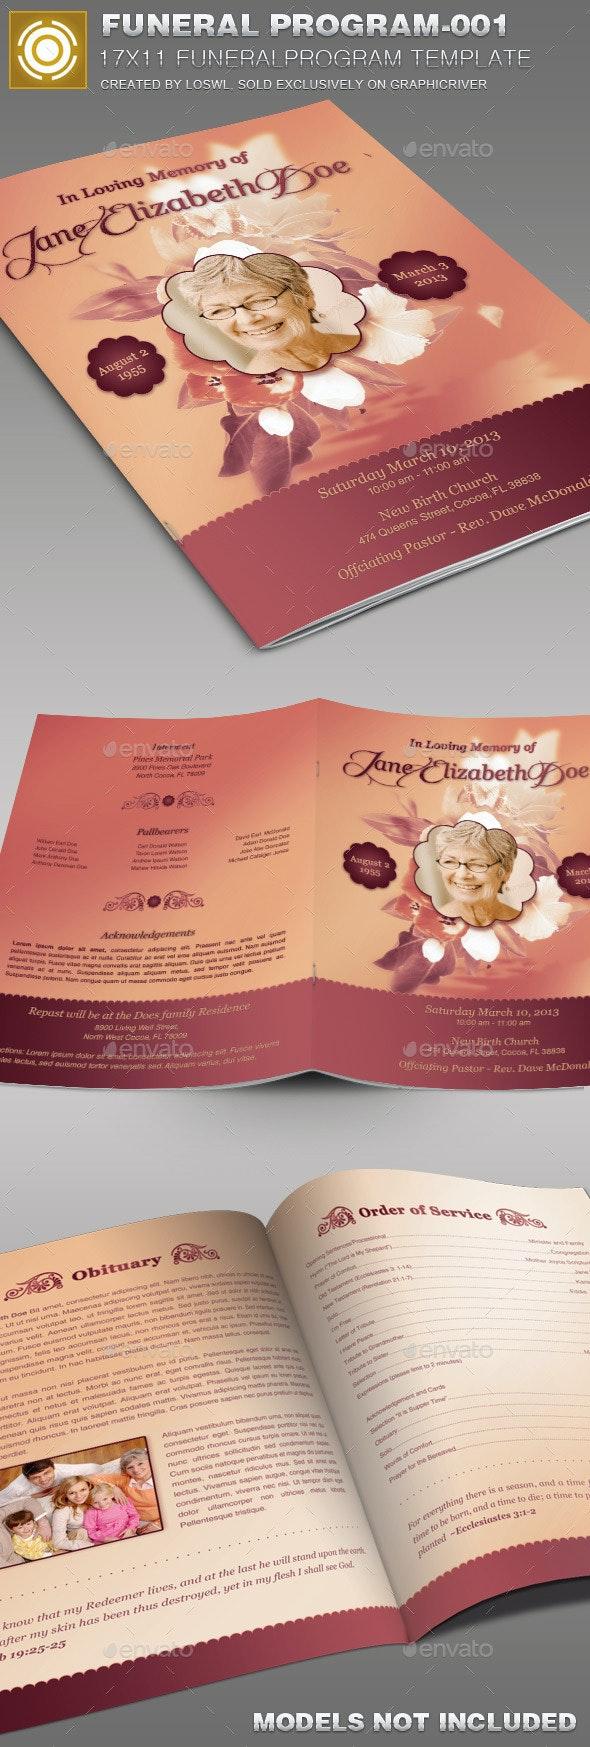 Funeral Program Template-001 - Church Flyers